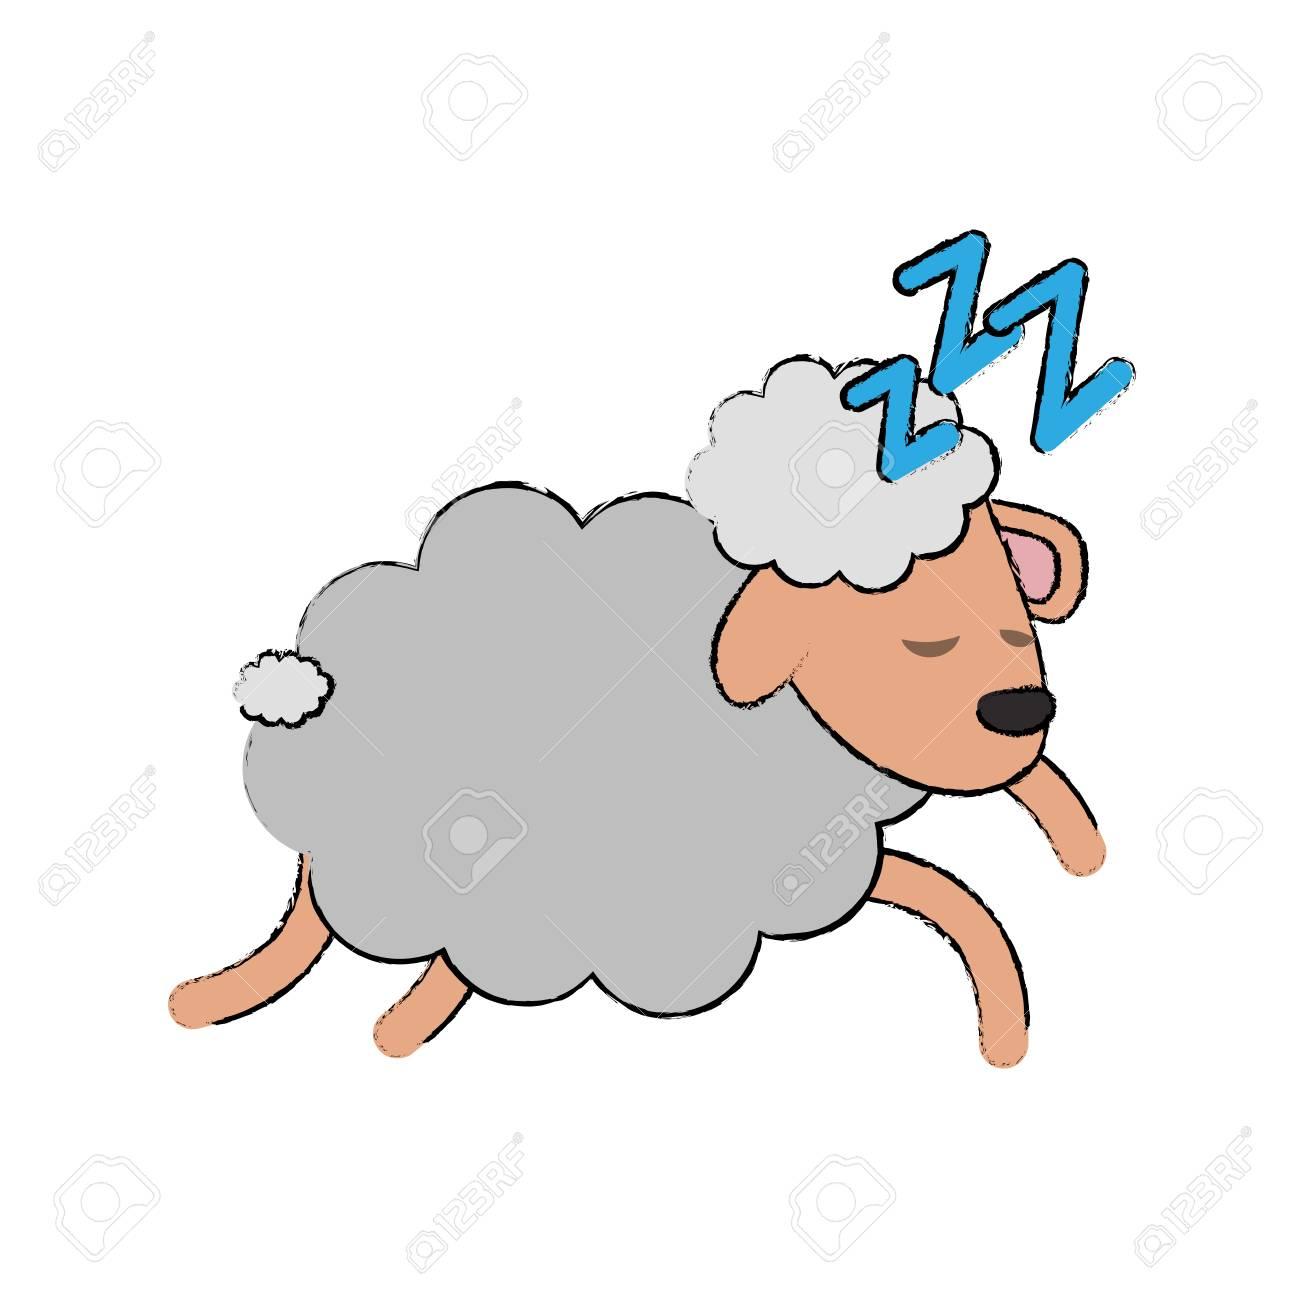 Sheep Sleeping Cartoon Icon Vector Illustration Graphic Design Royalty Free Cliparts Vectors And Stock Illustration Image 94440031